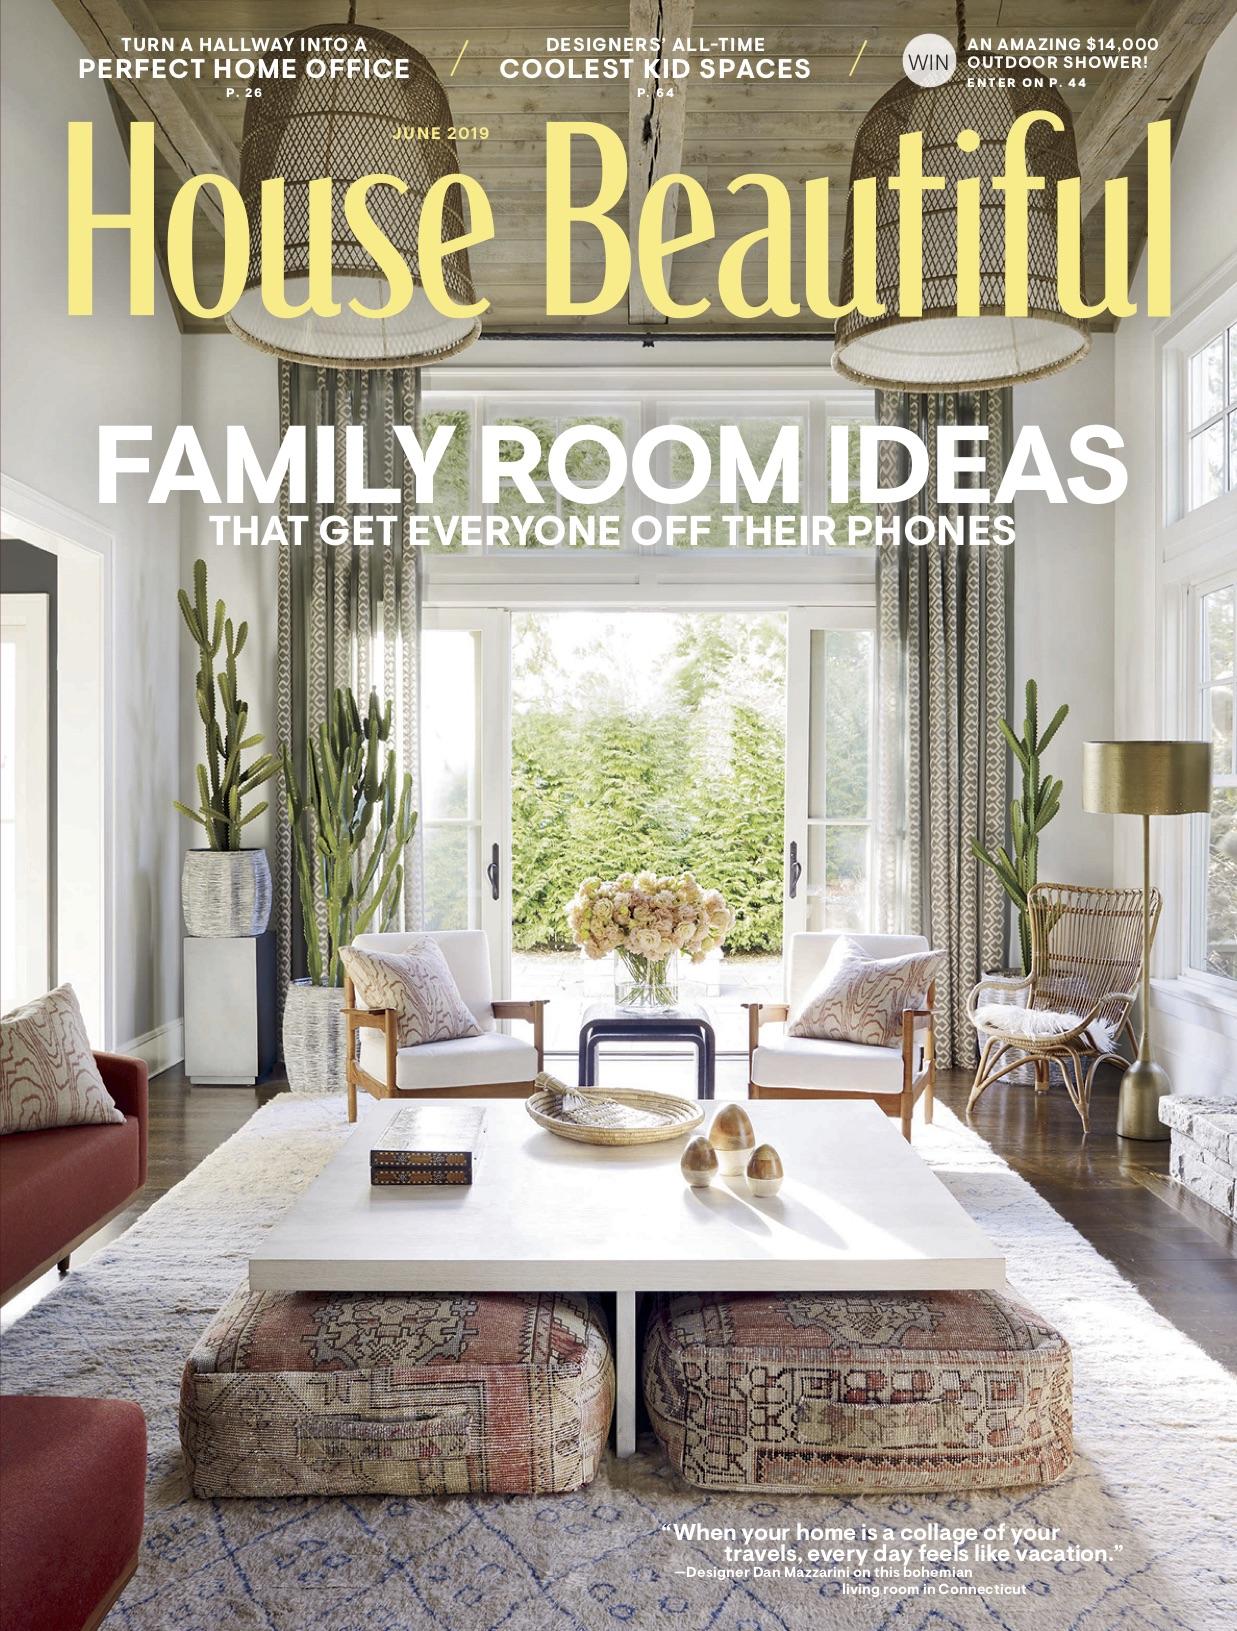 House Beautiful -- June 2019 Cover.jpg